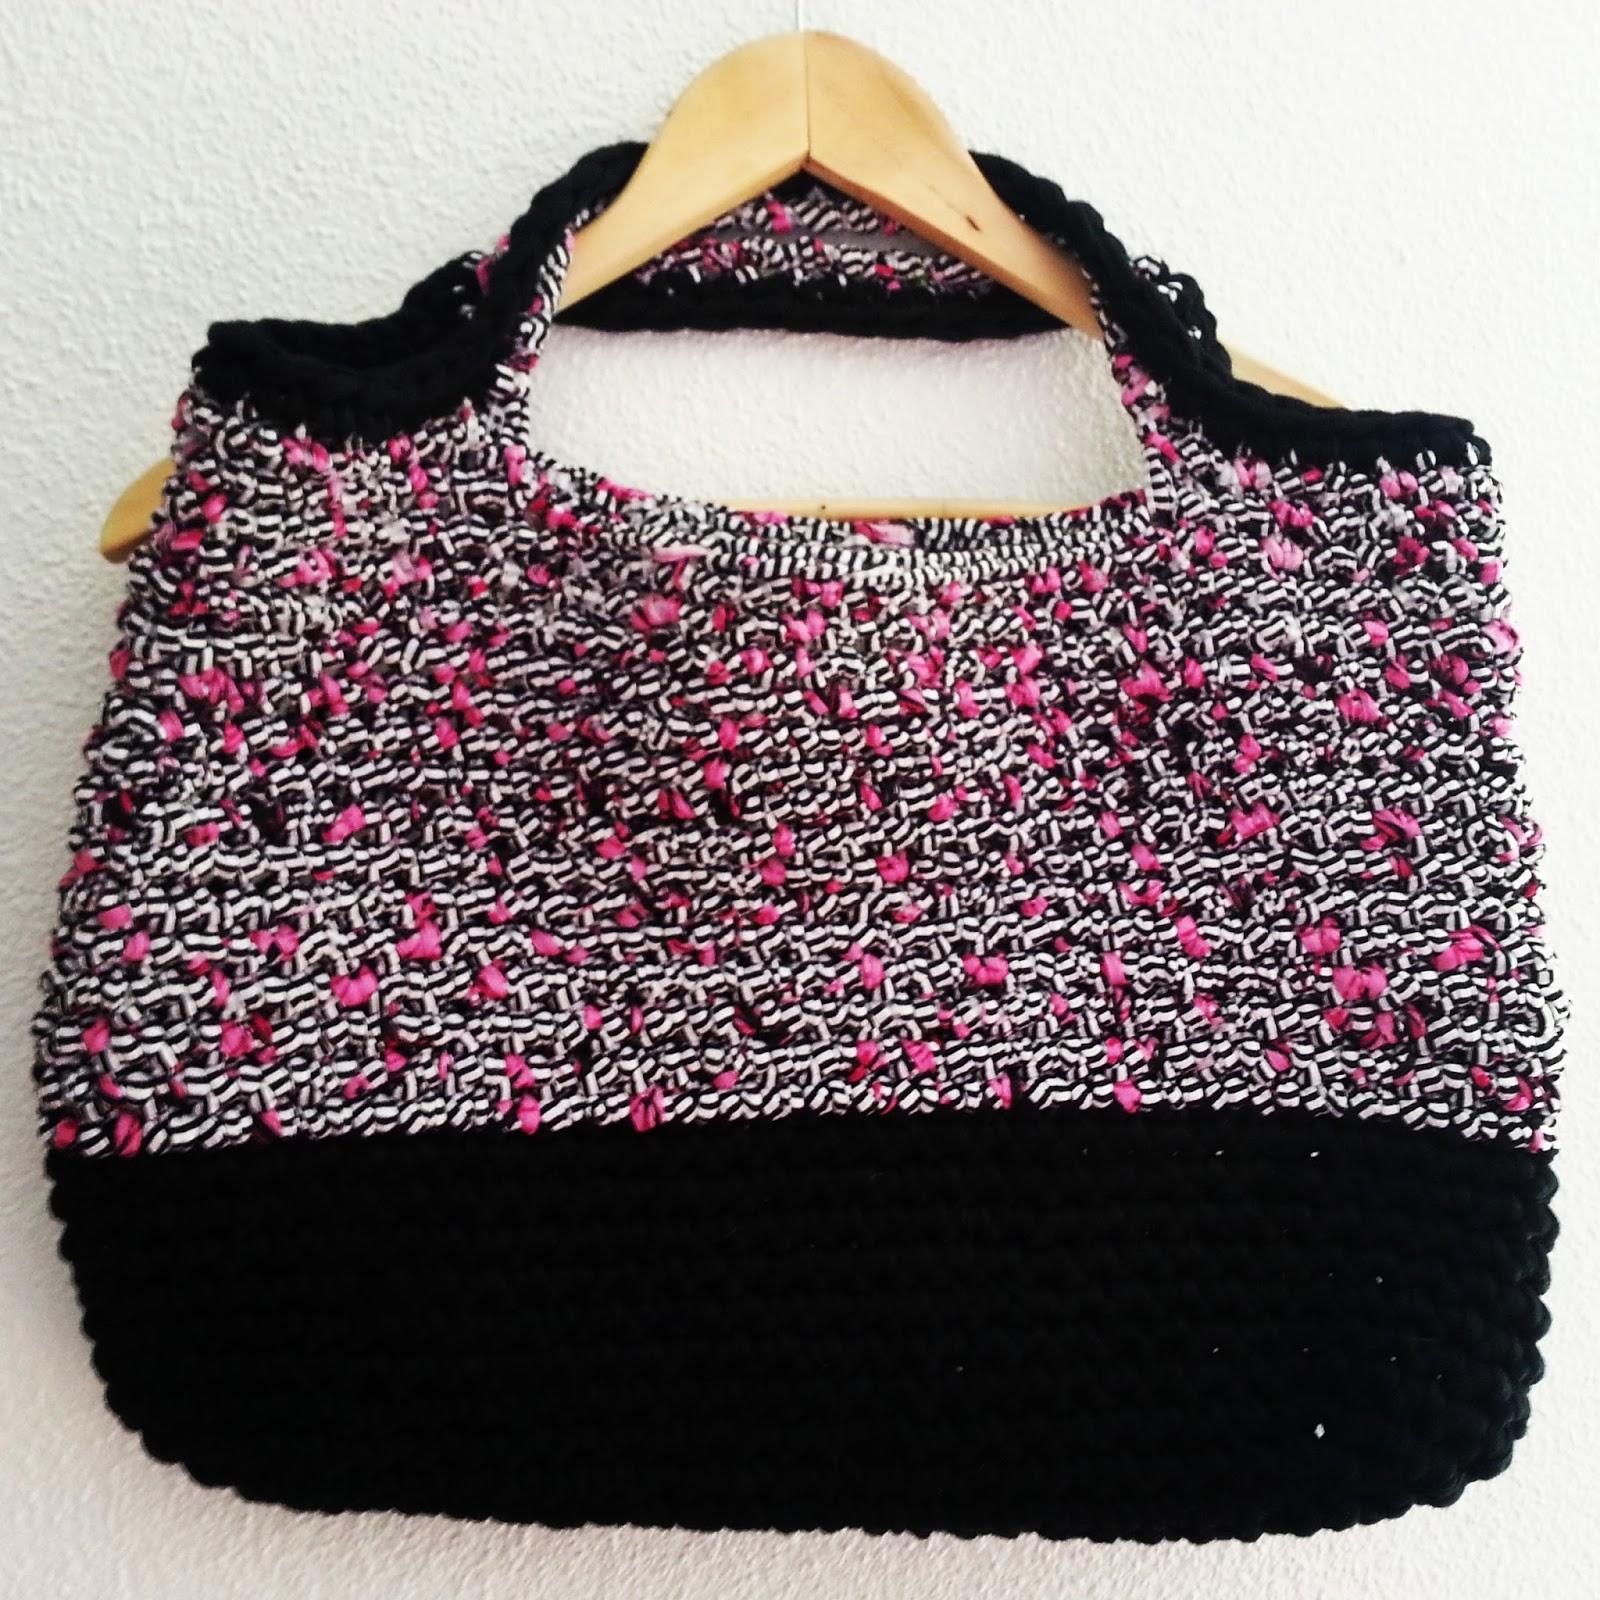 F e du tricot sac cabas en trapilho tuto inside - Tuto pour creer un sac en crochet ...